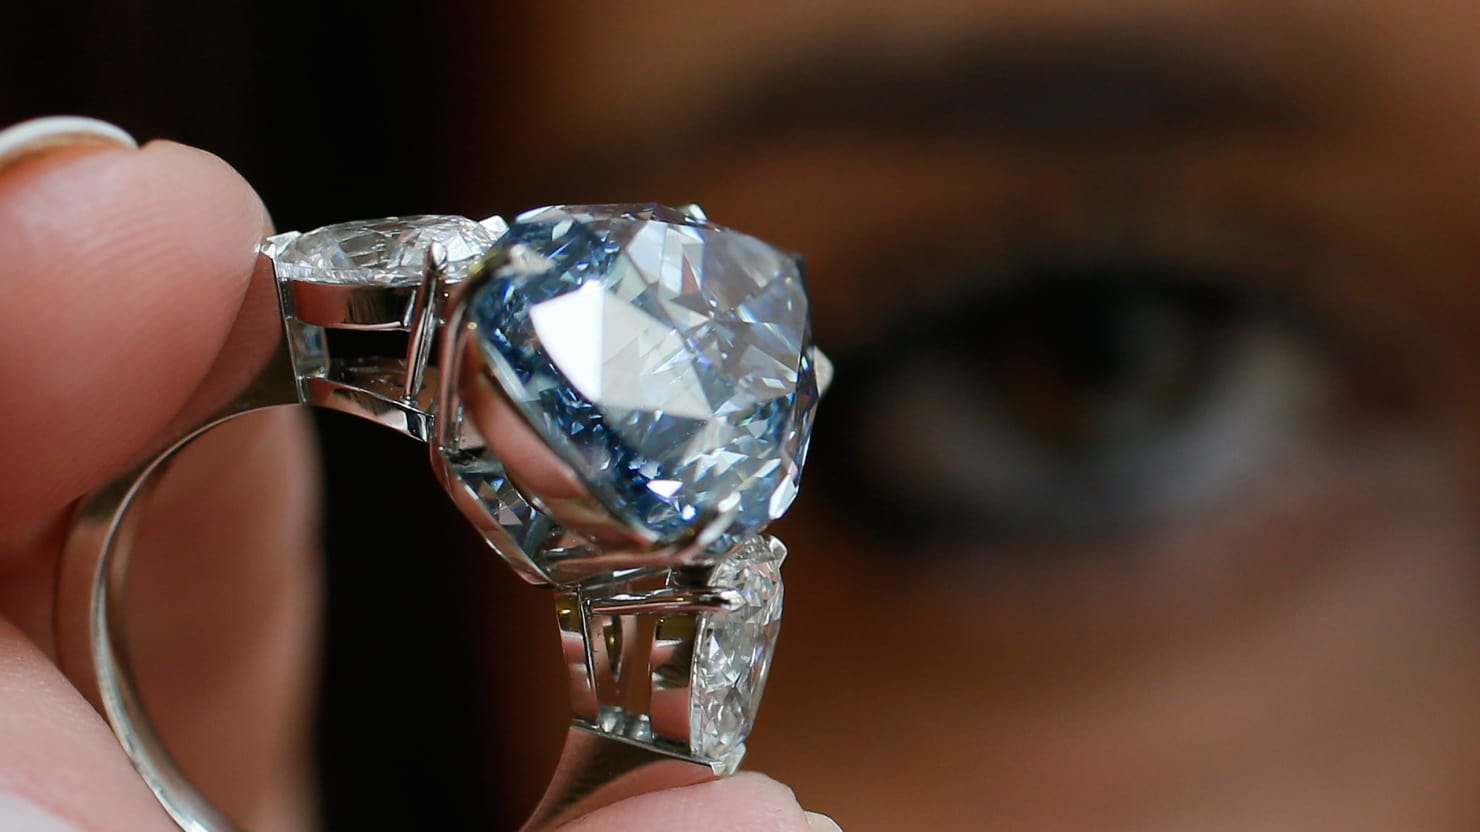 https: img-z.okeinfo.net content 2018 05 25 194 1902586 tips-rawat-perhiasan-berlian-biar-tetap-kinclong-qxsJZnw0He.jpg